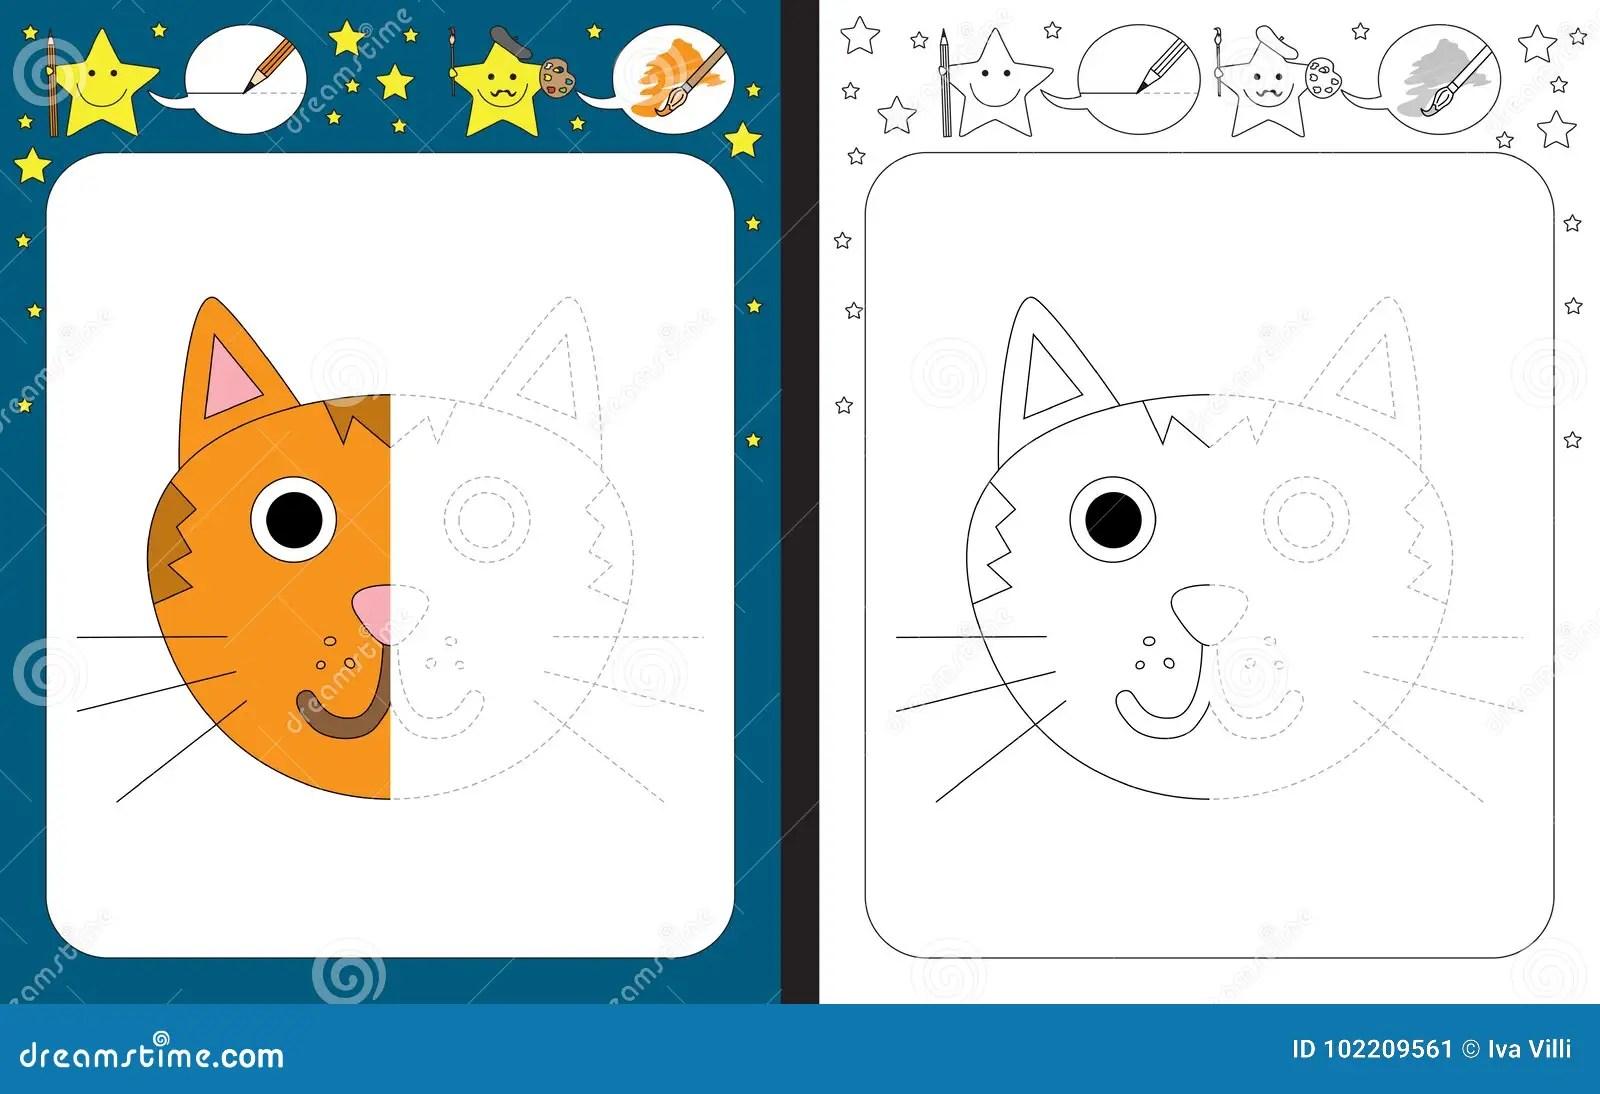 Preschool Worksheet Stock Vector Illustration Of Symmetry